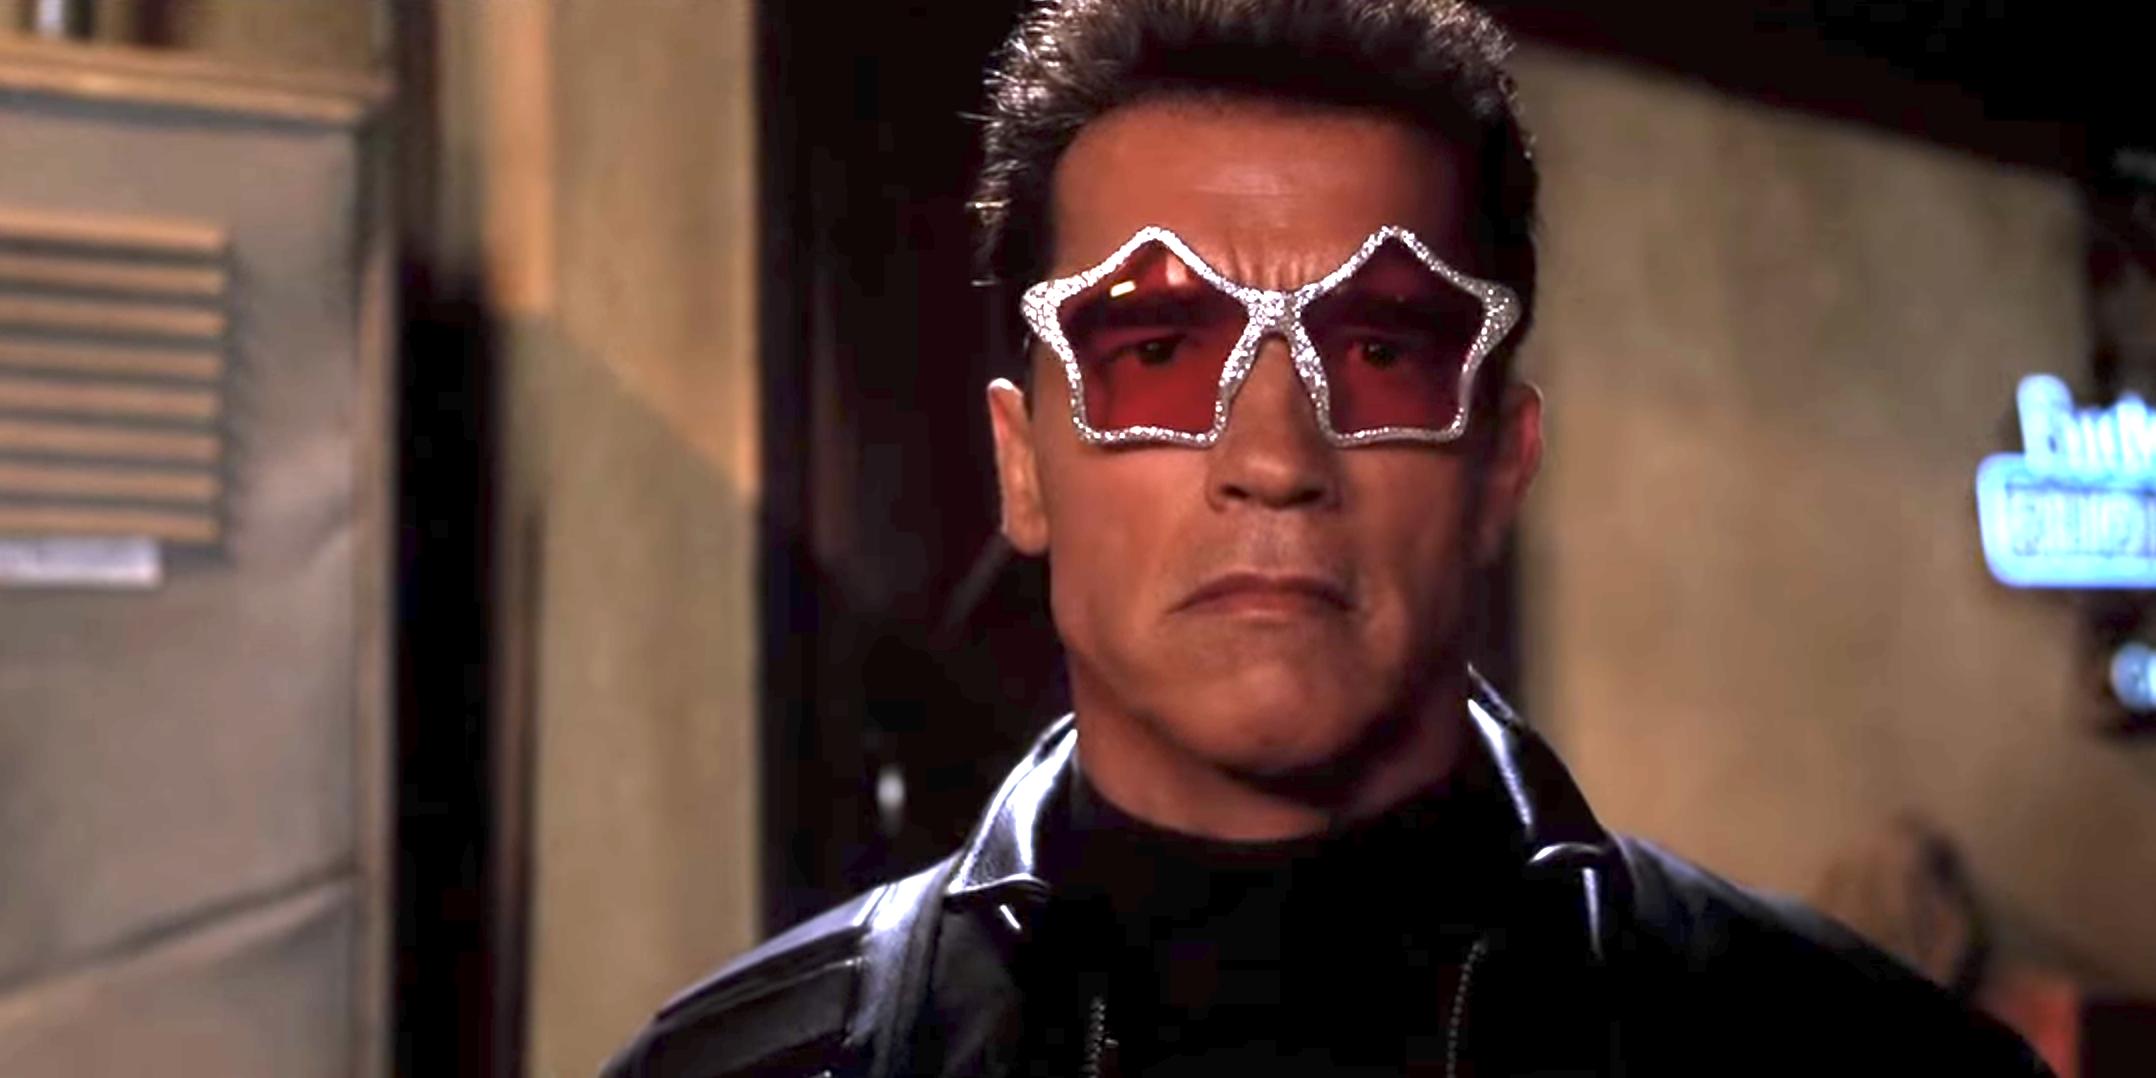 James Cameron's Next 'Terminator' Movie Might Have Found Its Star